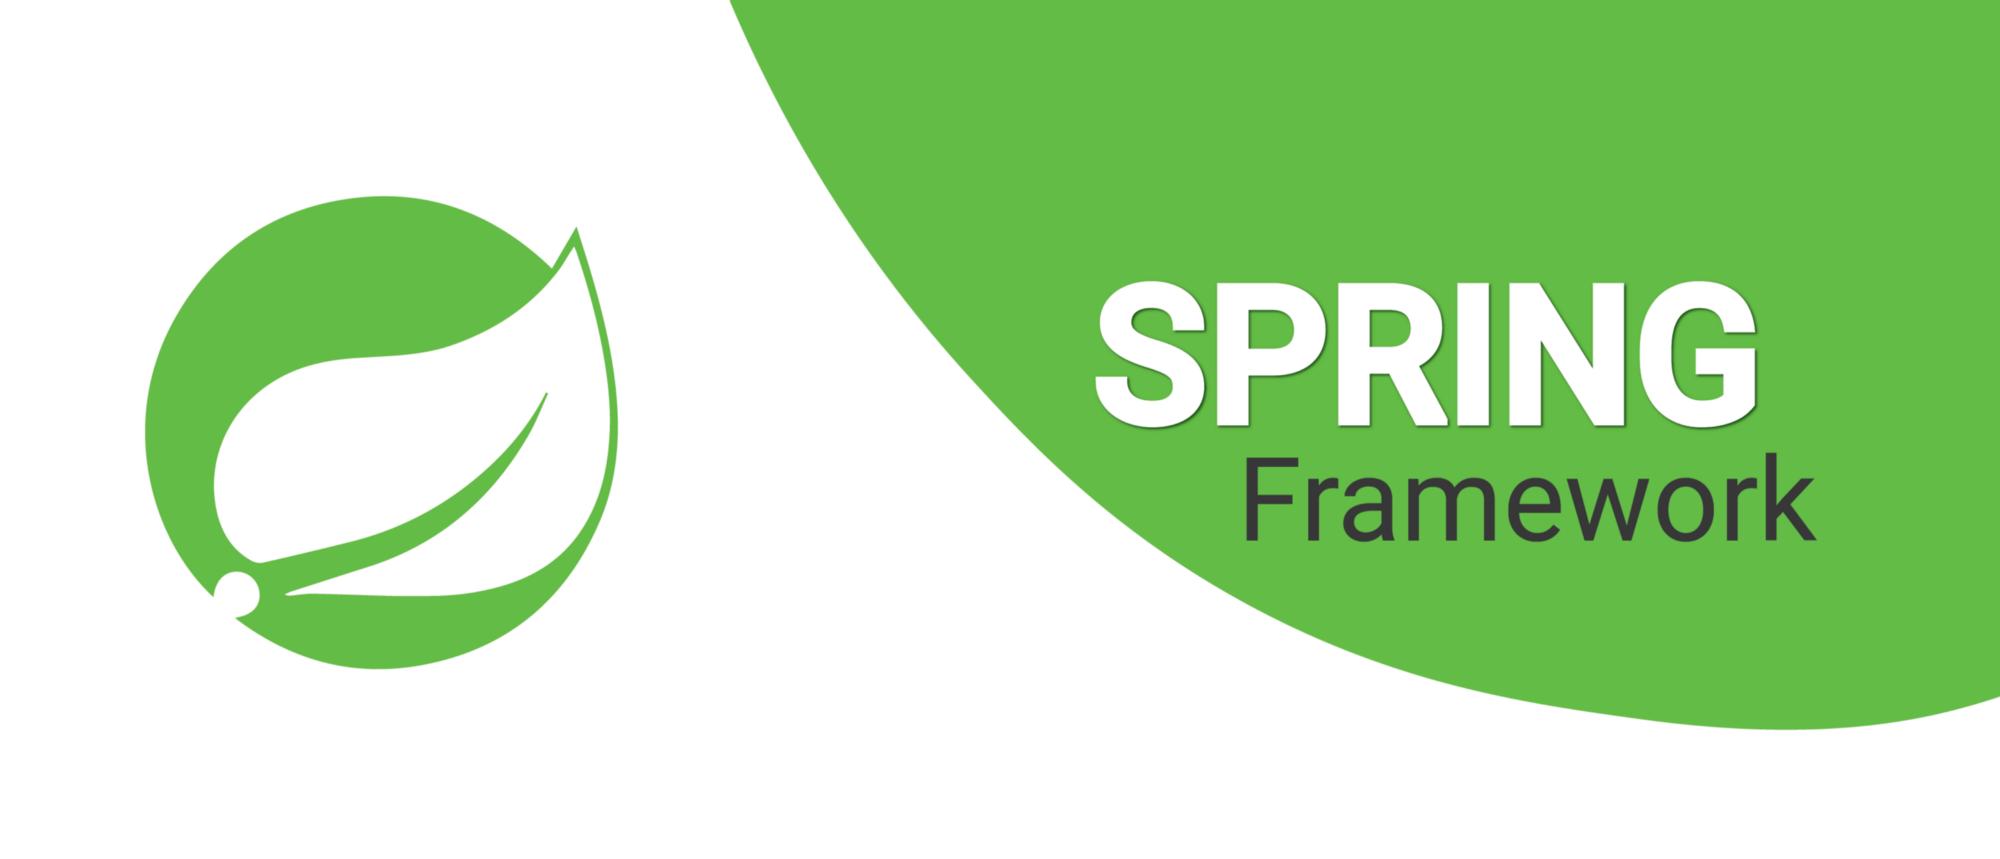 SpringFramework-annotation